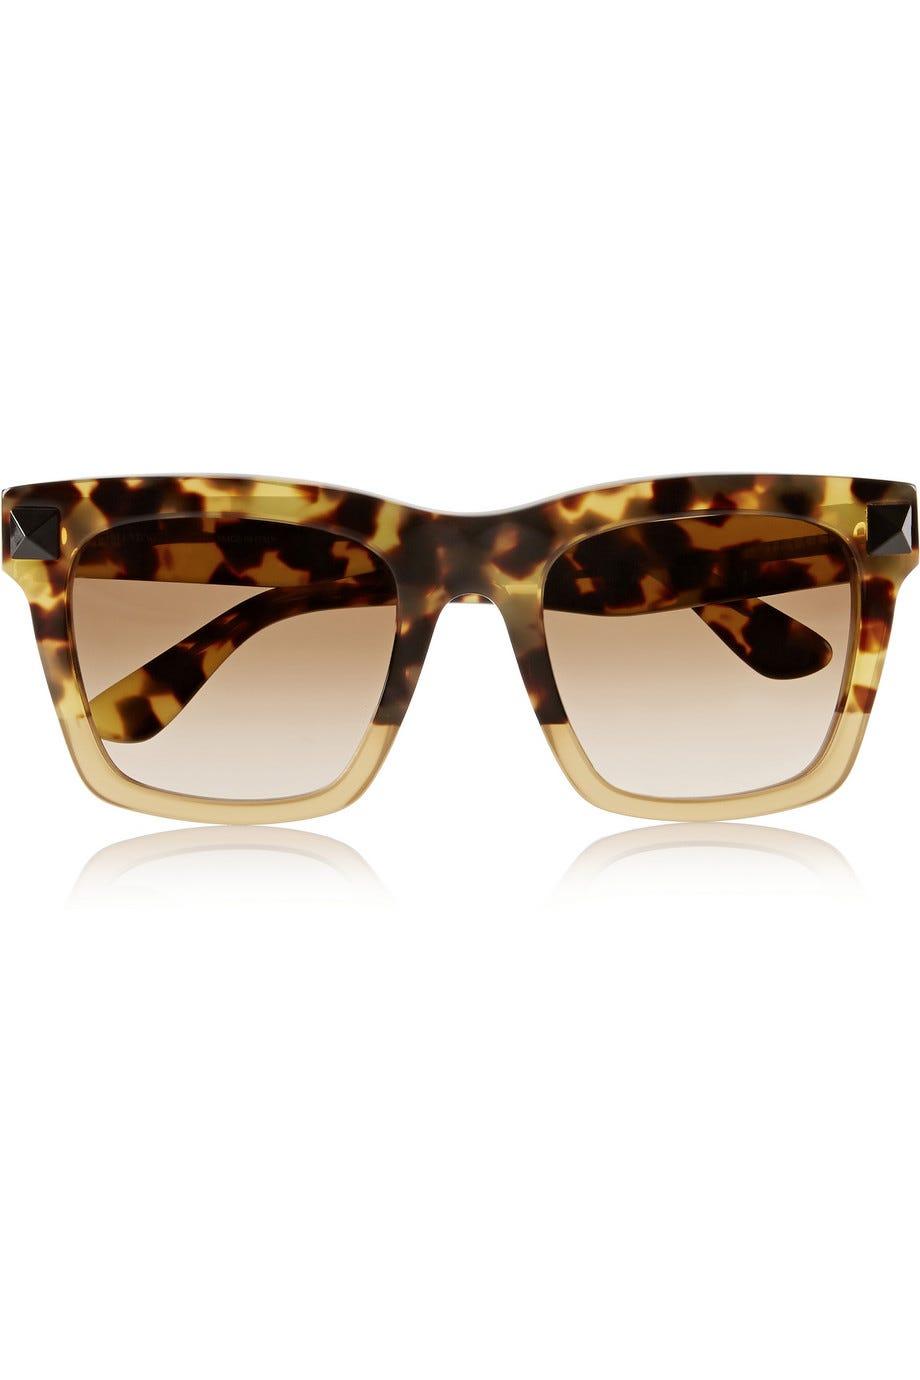 Valentino + D-frame Acetate Sunglasses